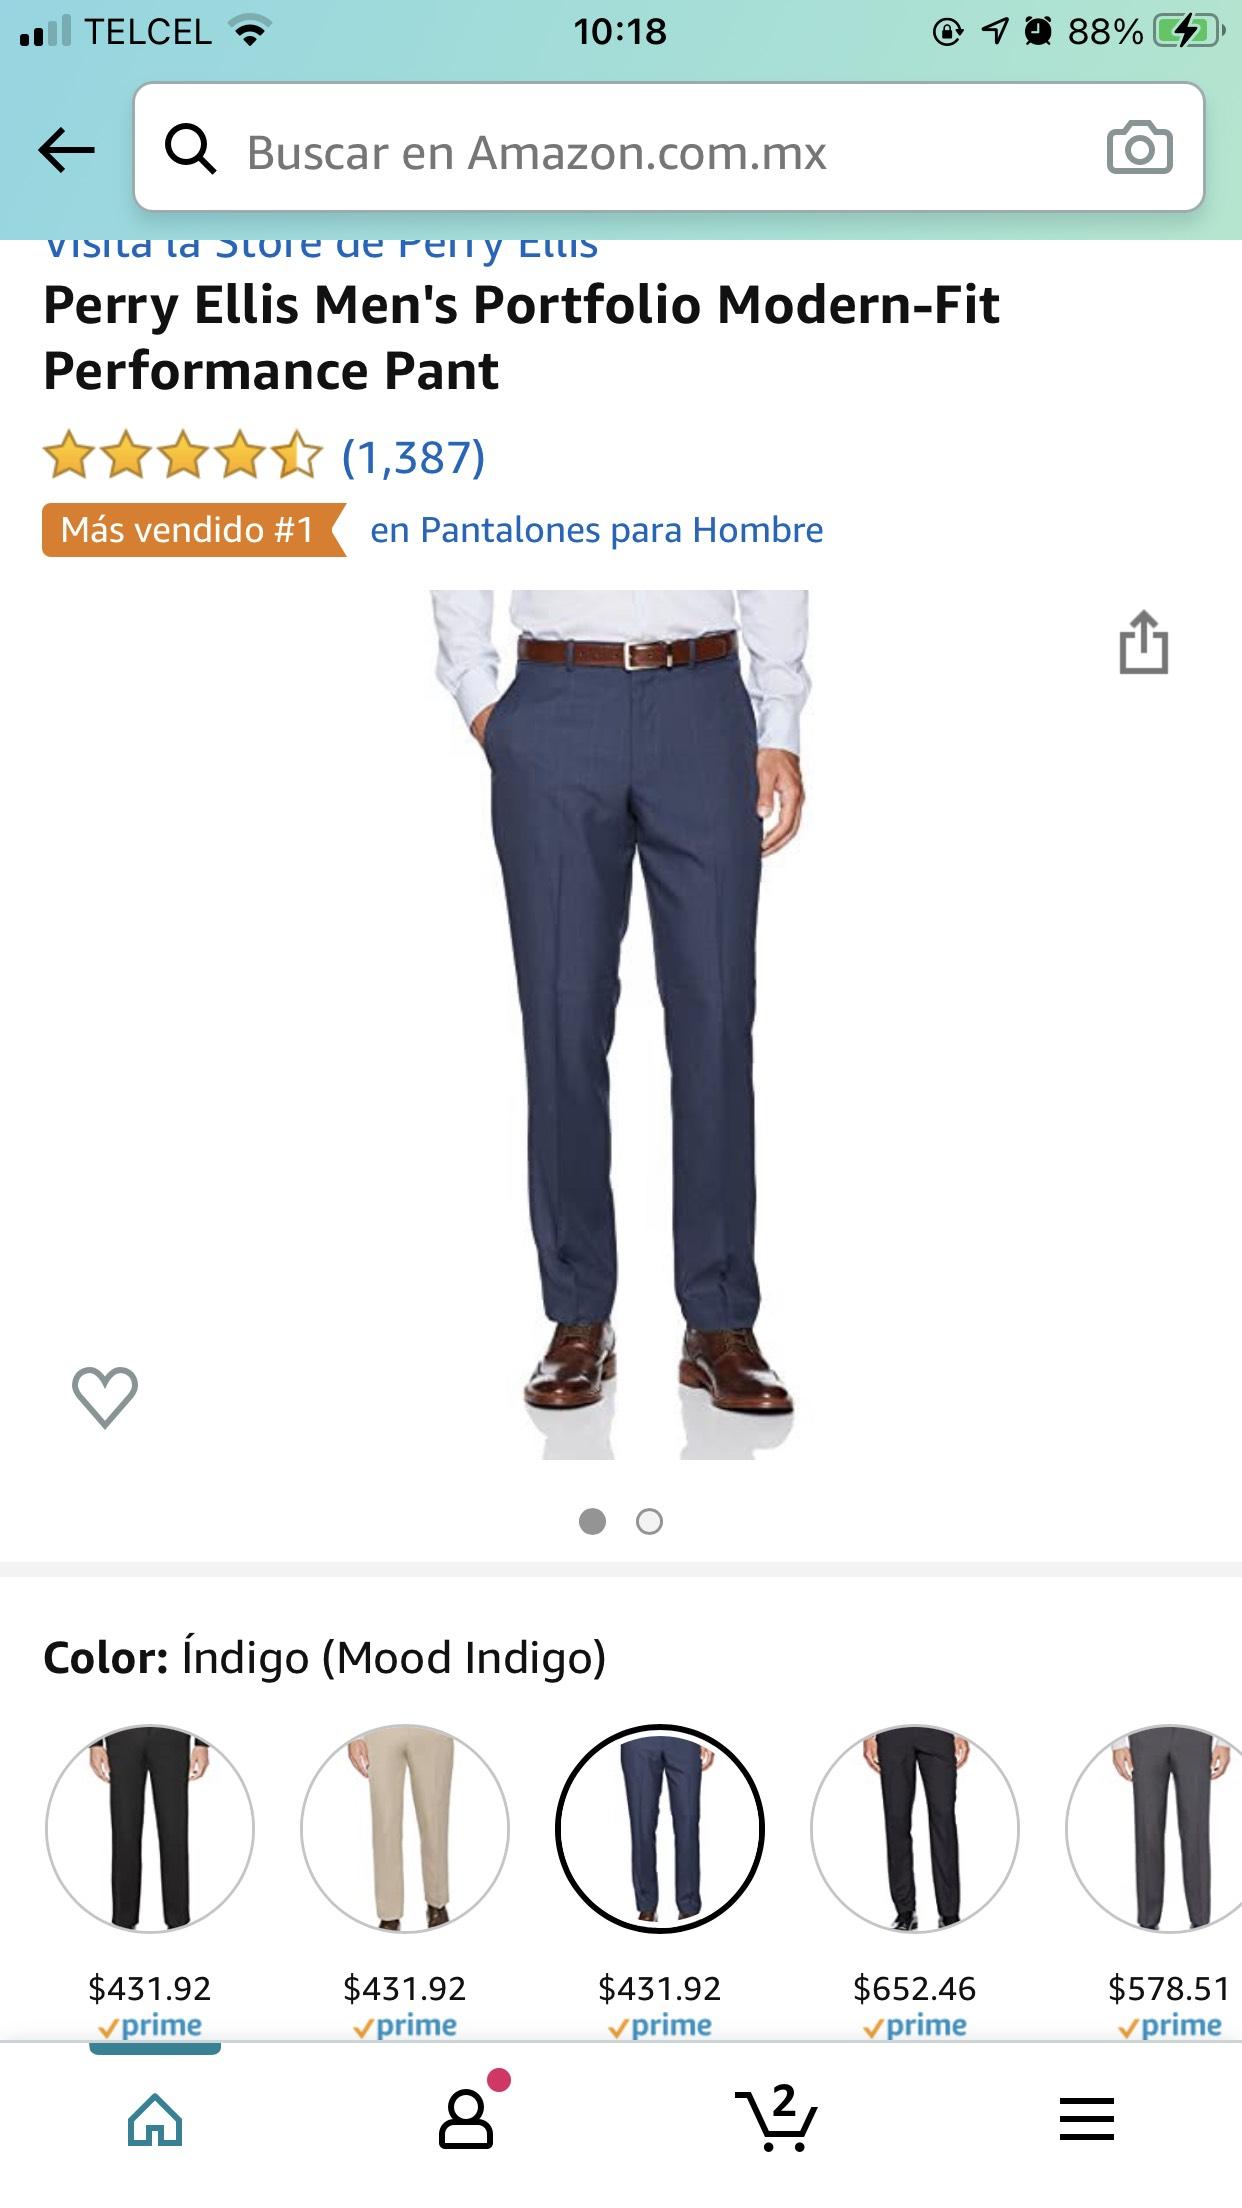 Amazon Perry Ellis Men's Portfolio Modern-Fit Performance Pant varias tallas y colores